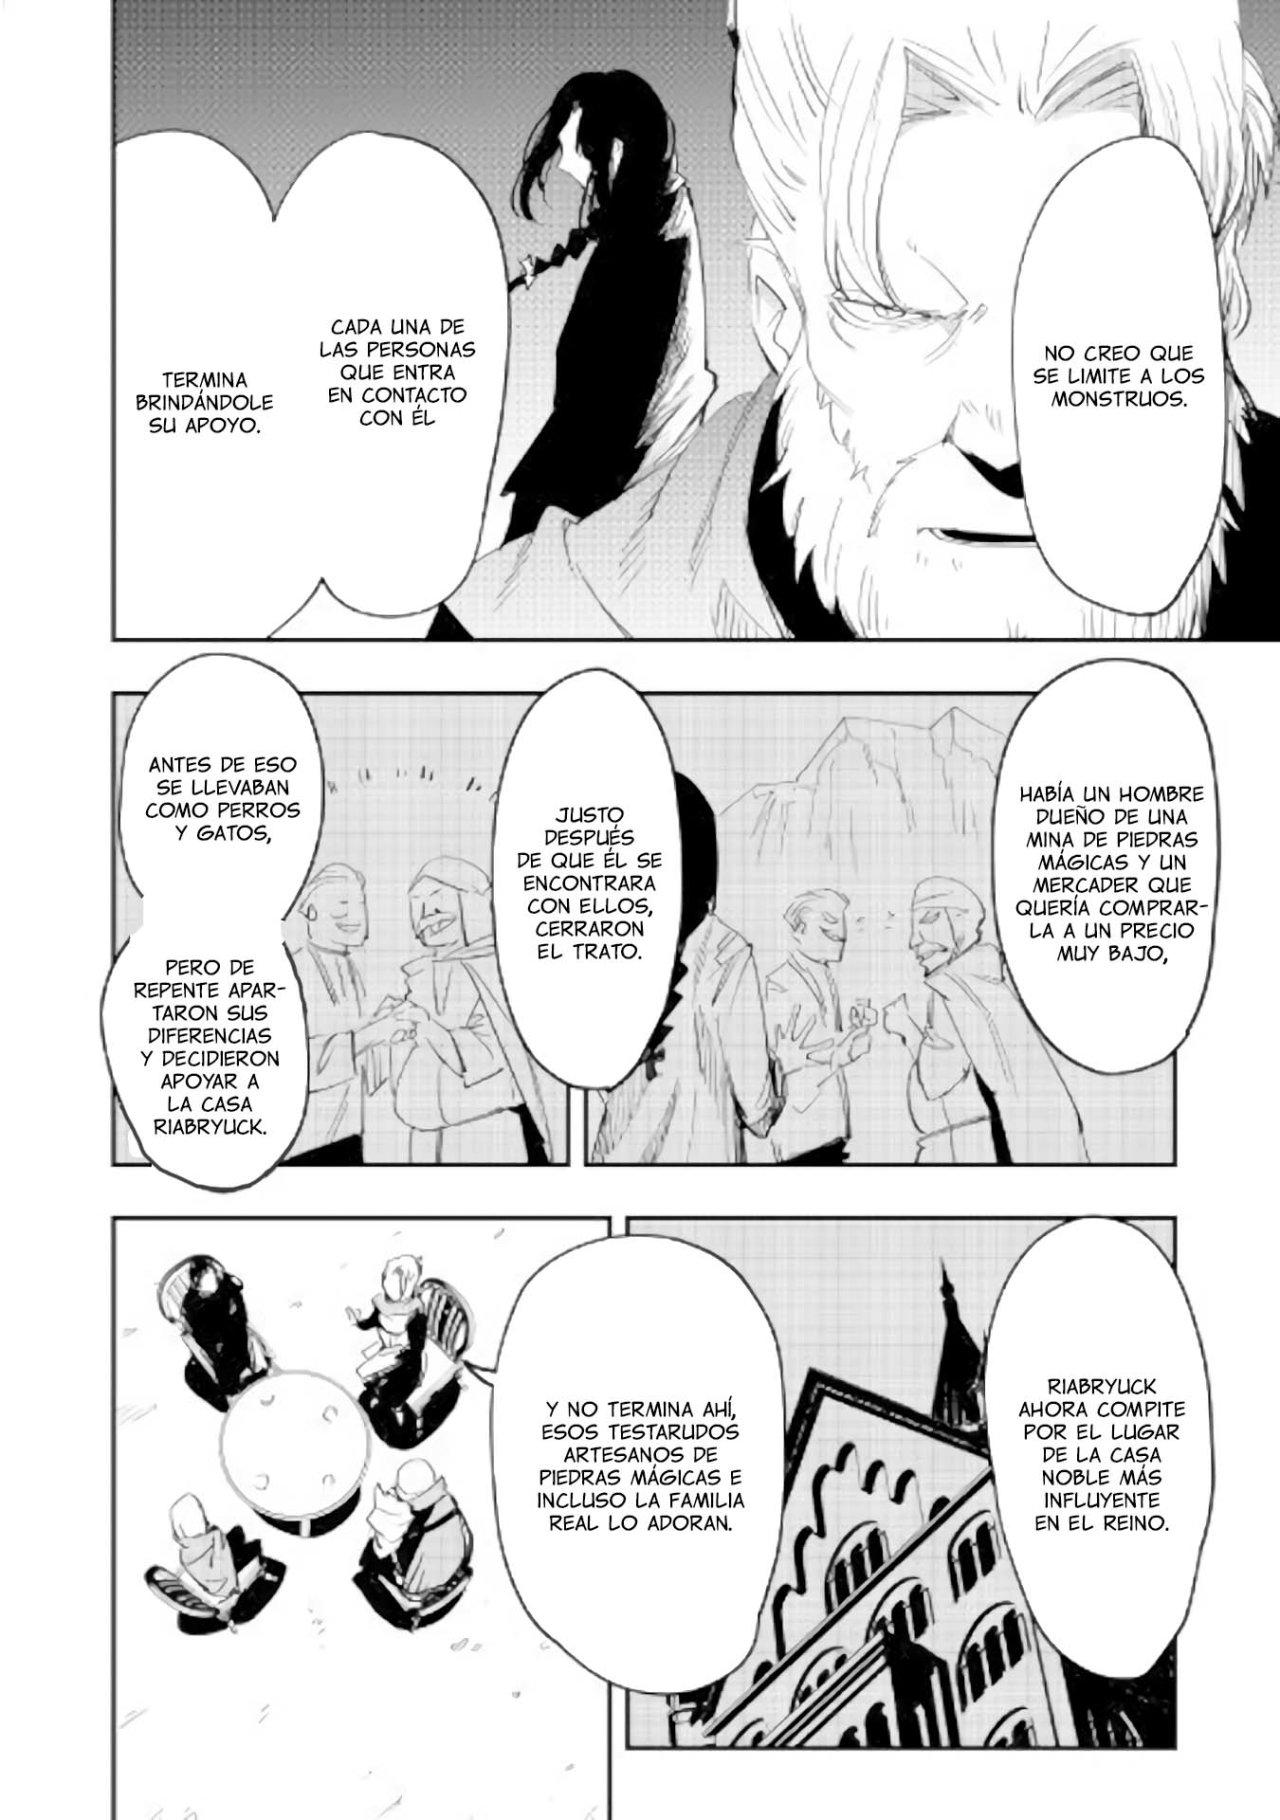 https://nine.mangadogs.com/es_manga/pic8/55/21175/947548/0a775948395e3339c2b13845170d2960.jpg Page 7